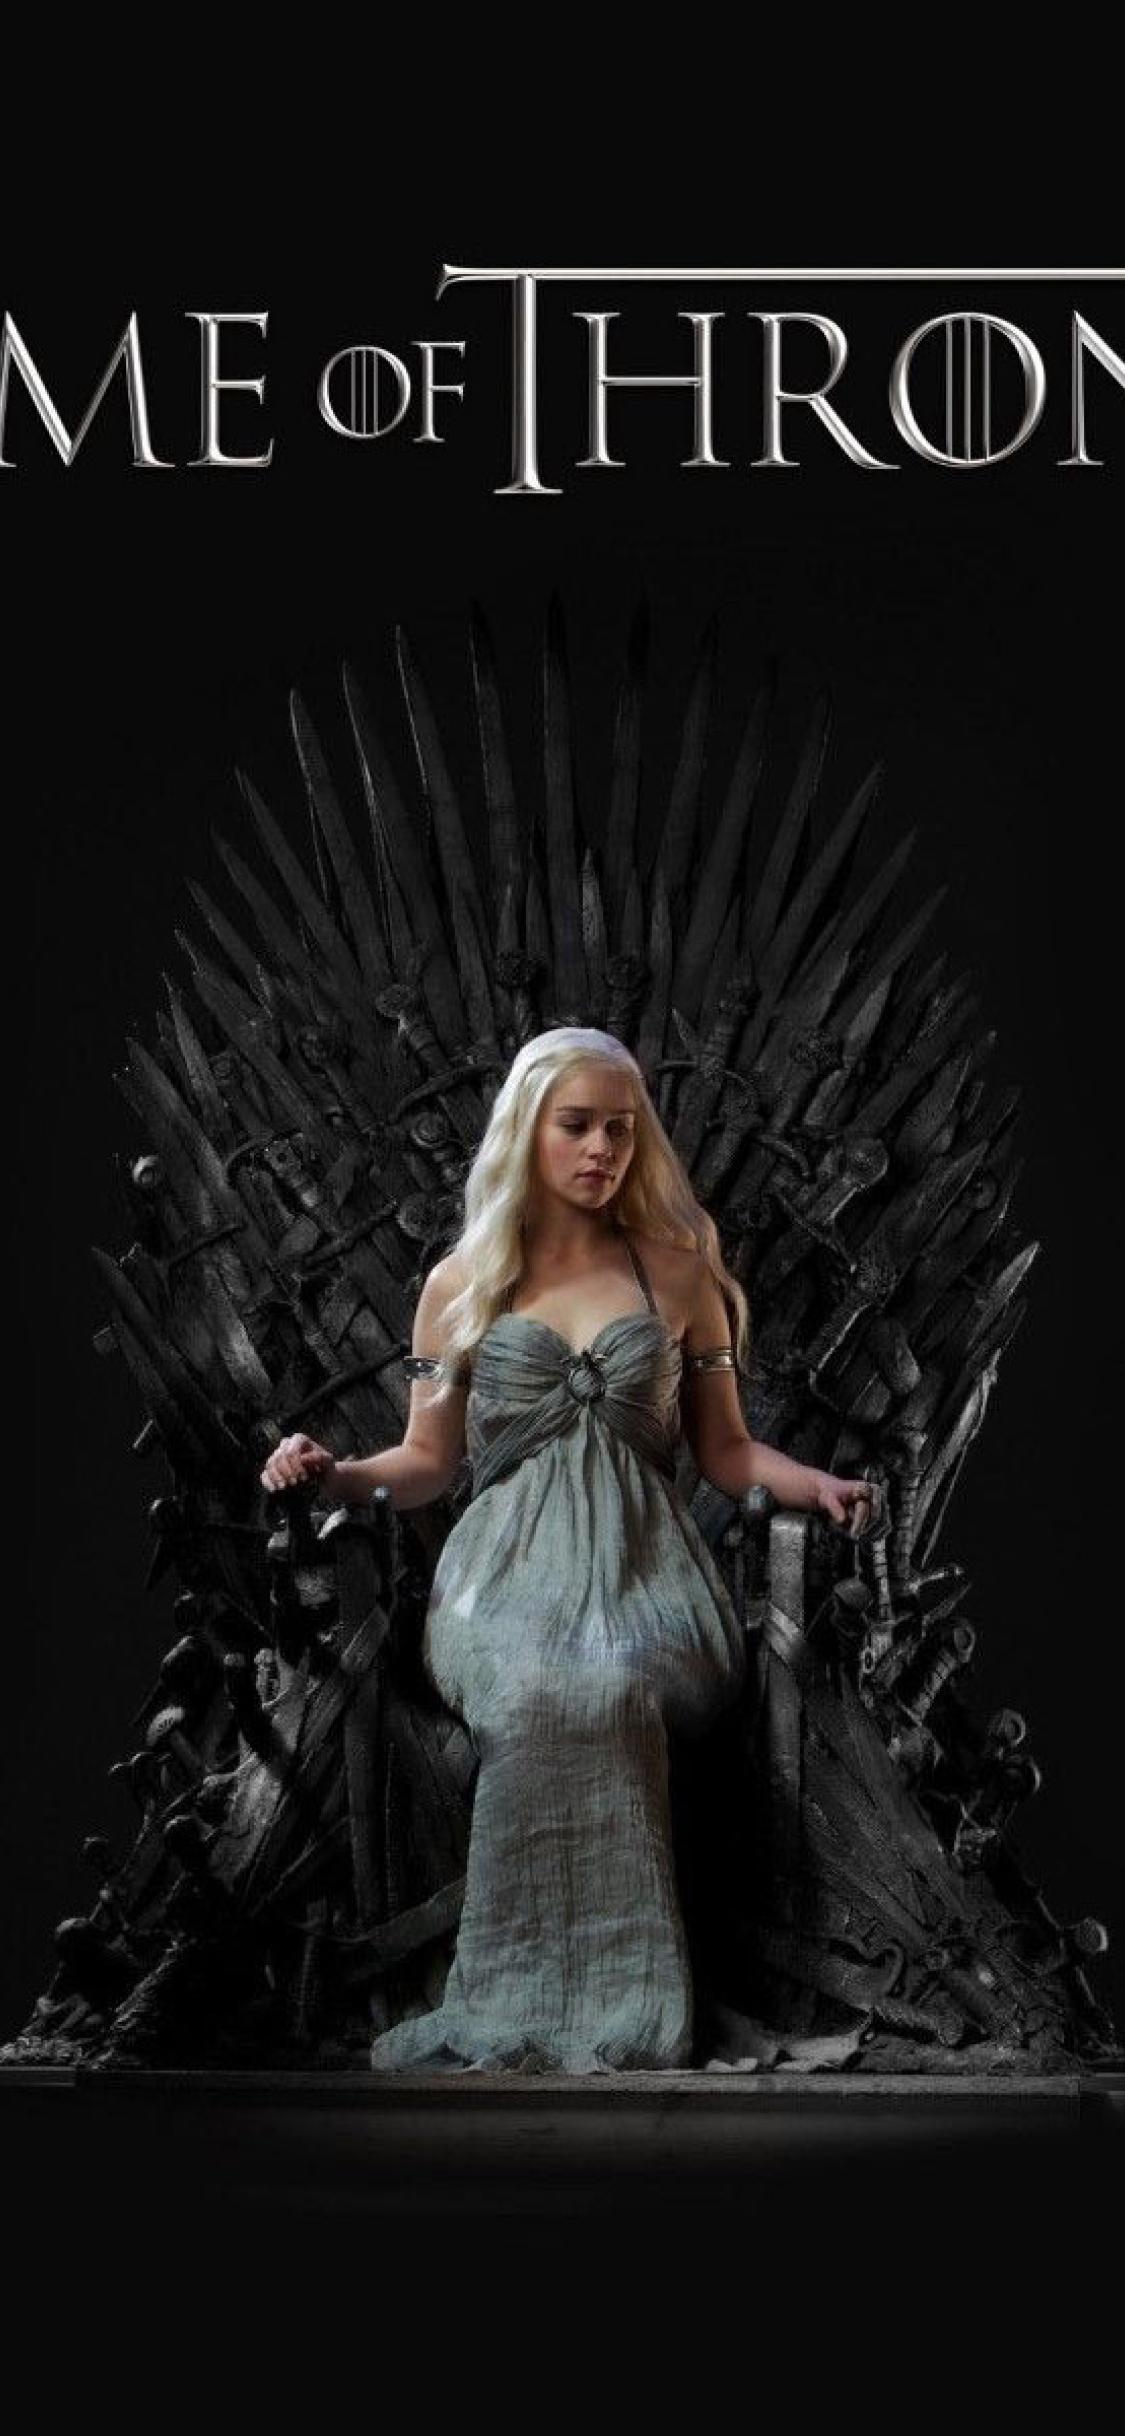 1125x2436 Daenerys Targaryen Game Of Thrones Tv Show